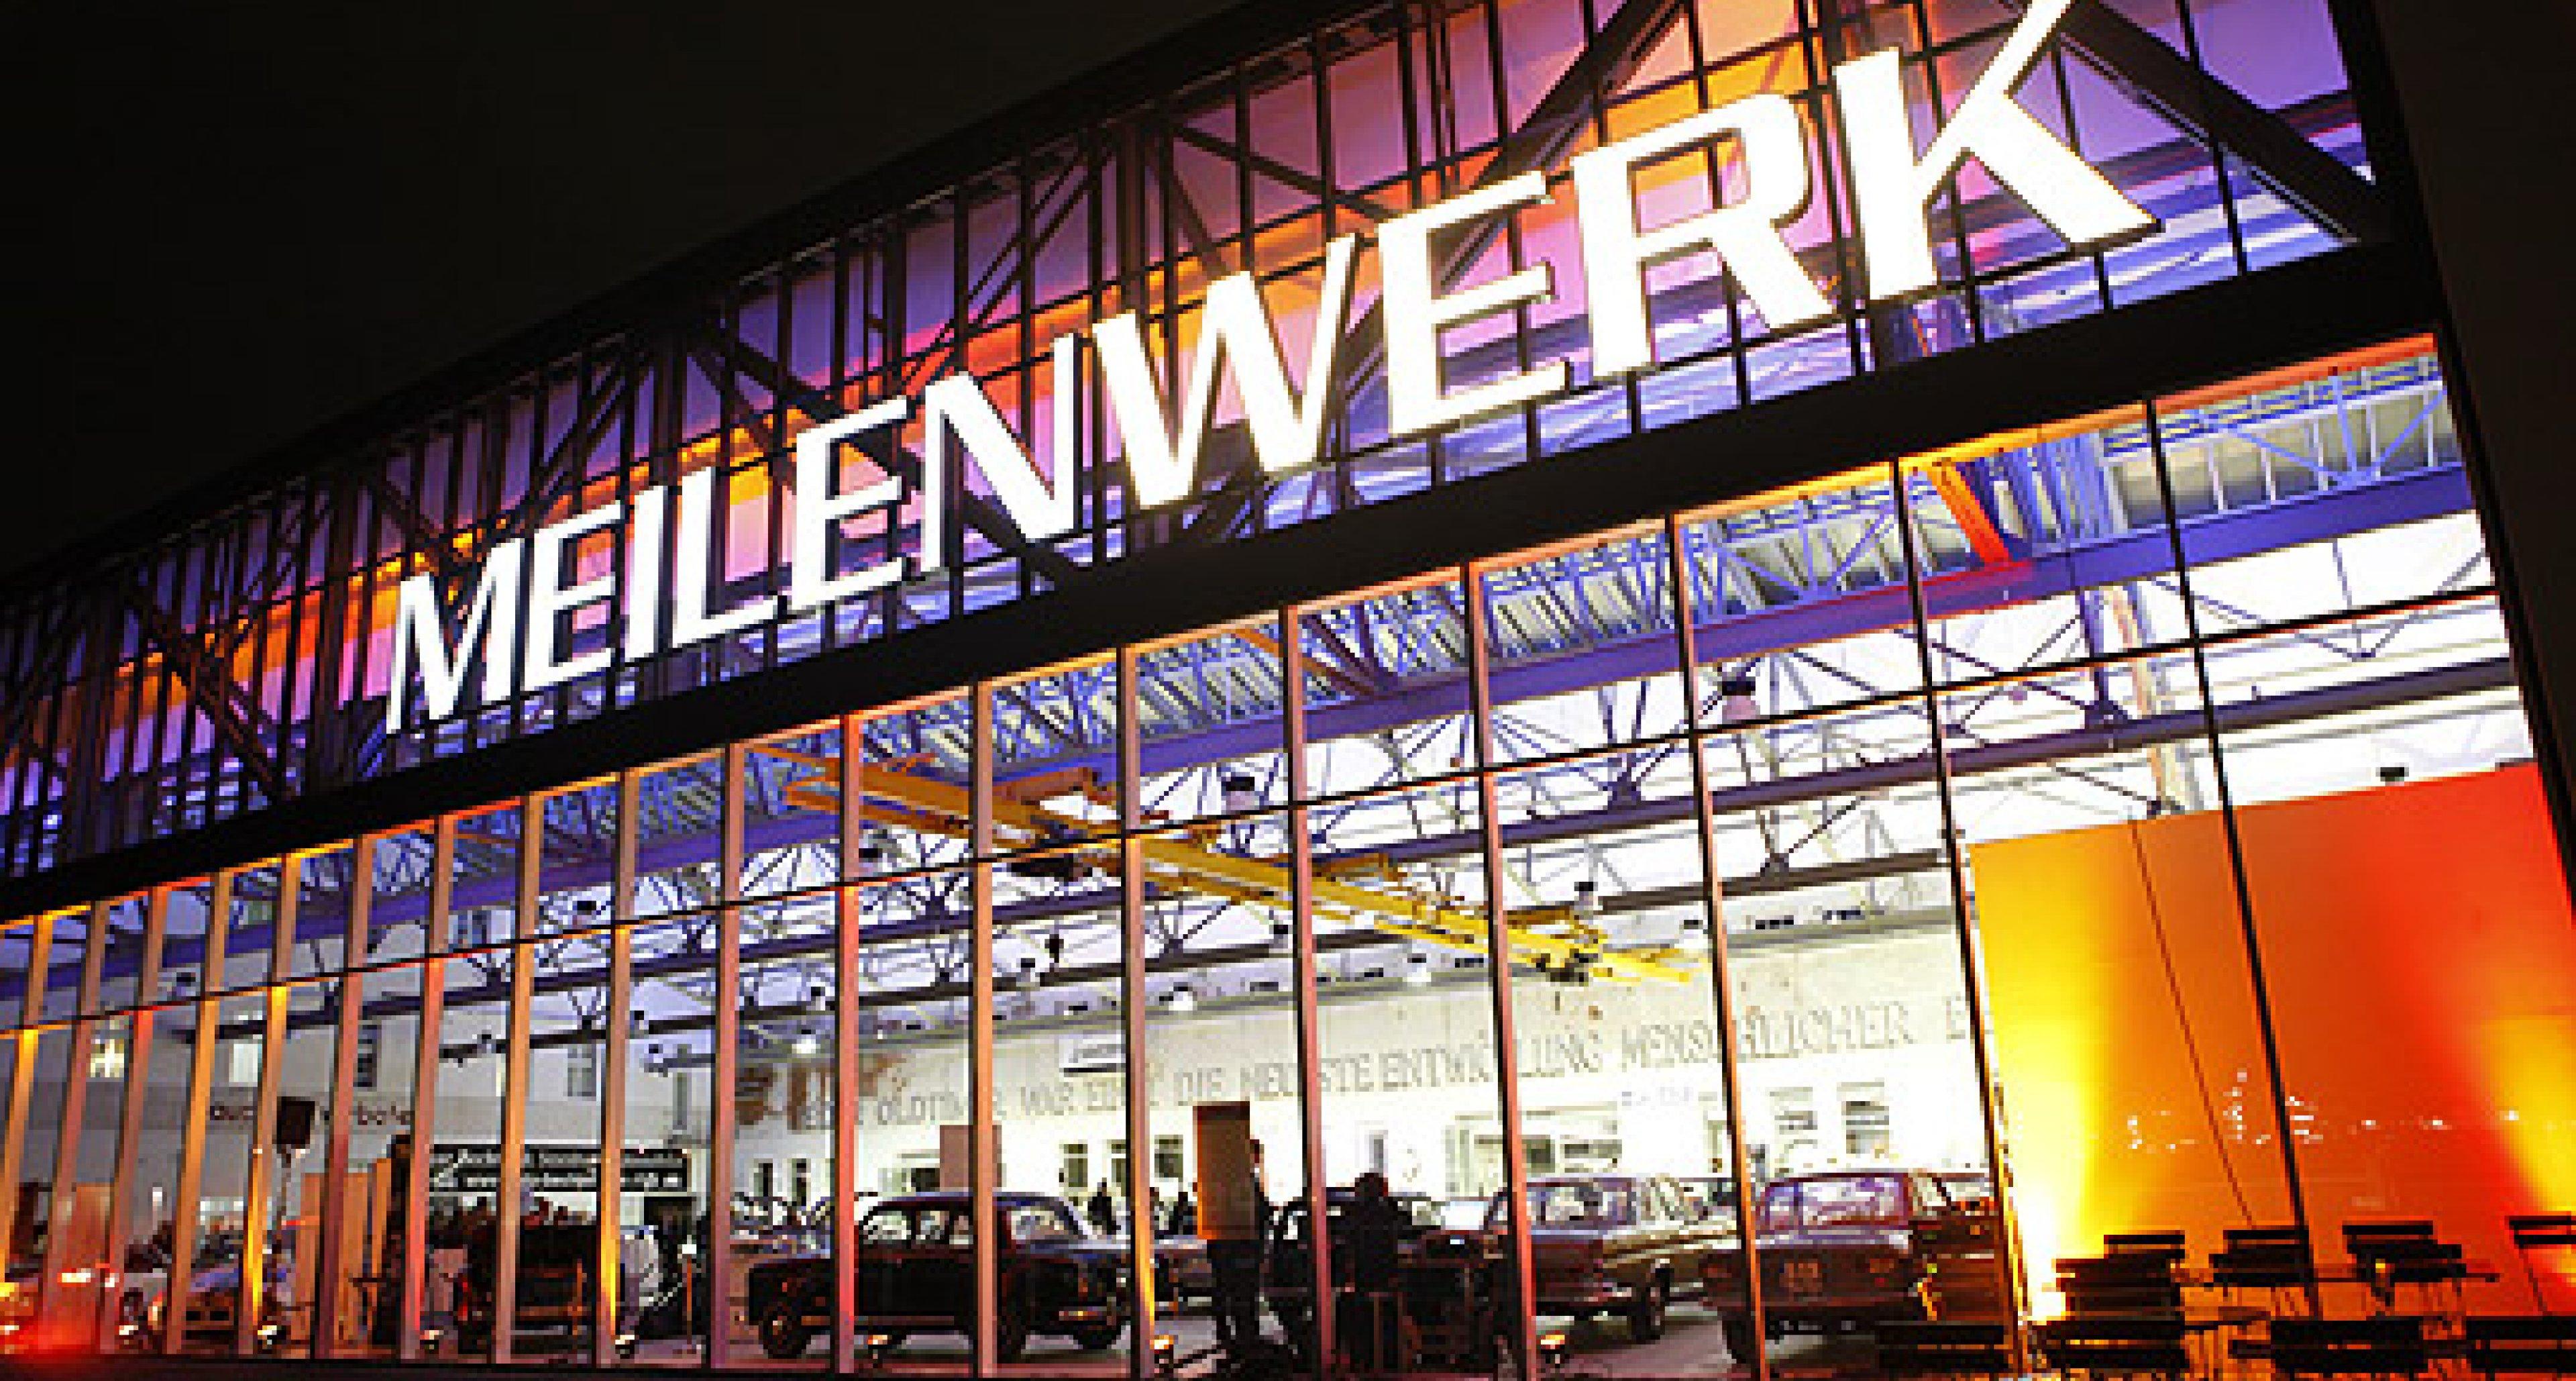 Classic Driver Marktplatz auf Meilenwerk.de